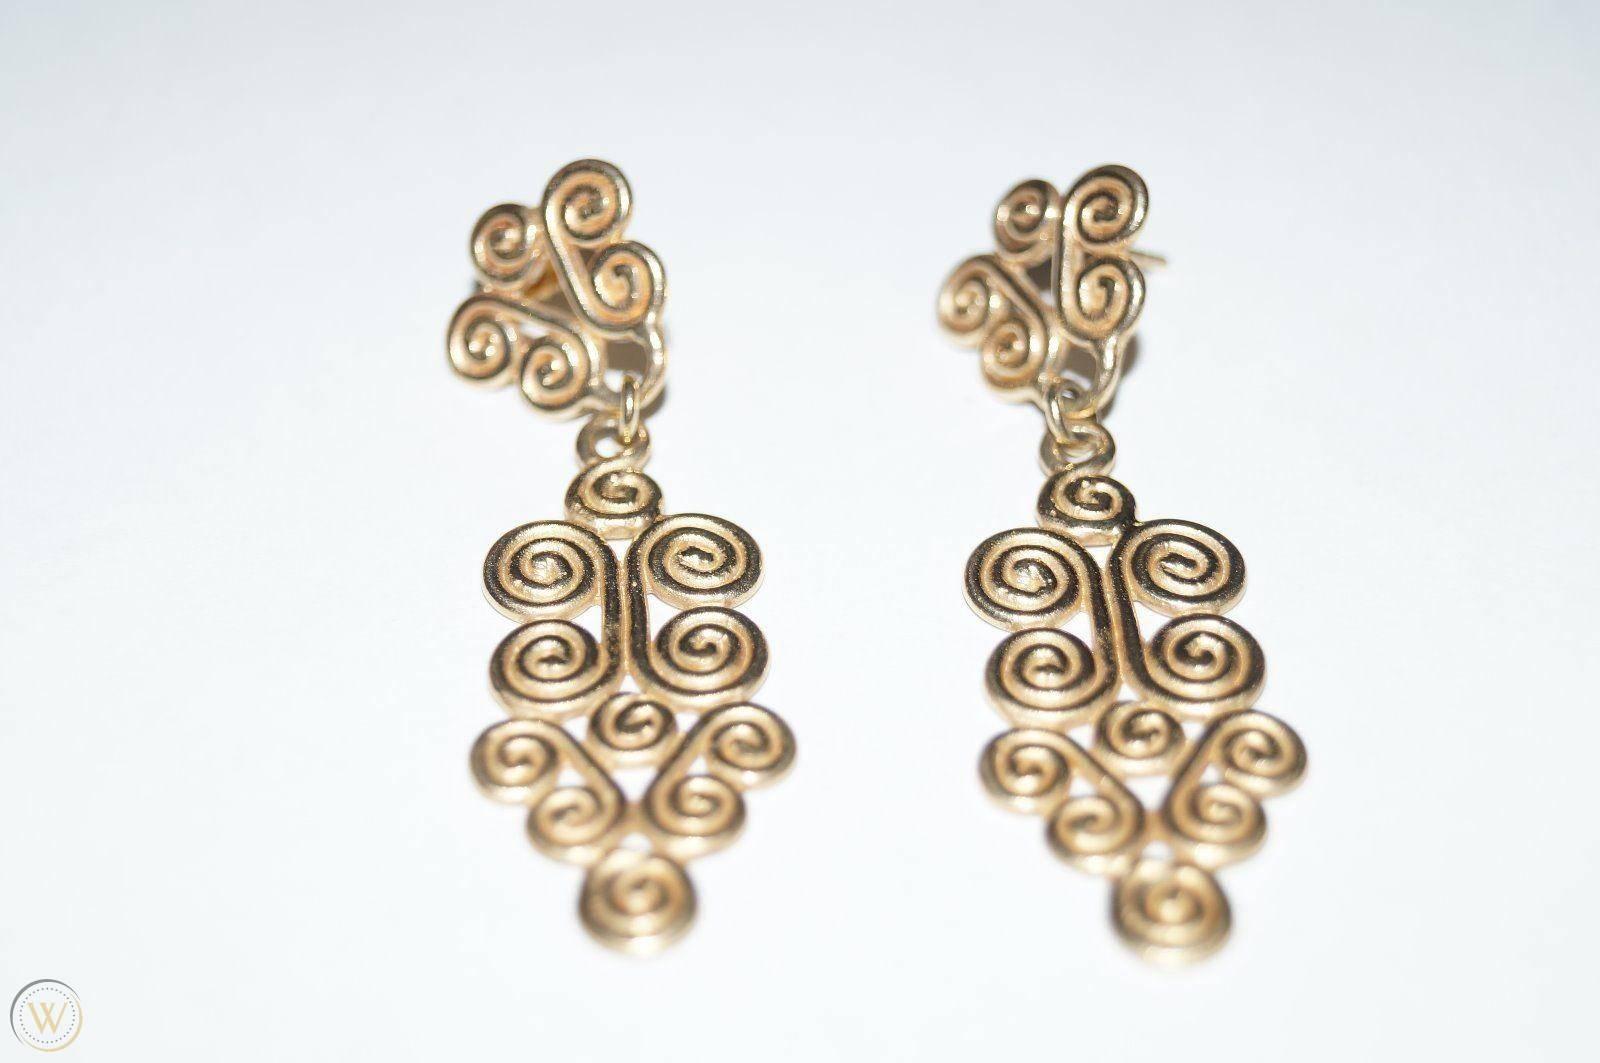 James avery swirl dangle earrings 14k 1 25ad74667b680d3eb61b6c6642039dfa